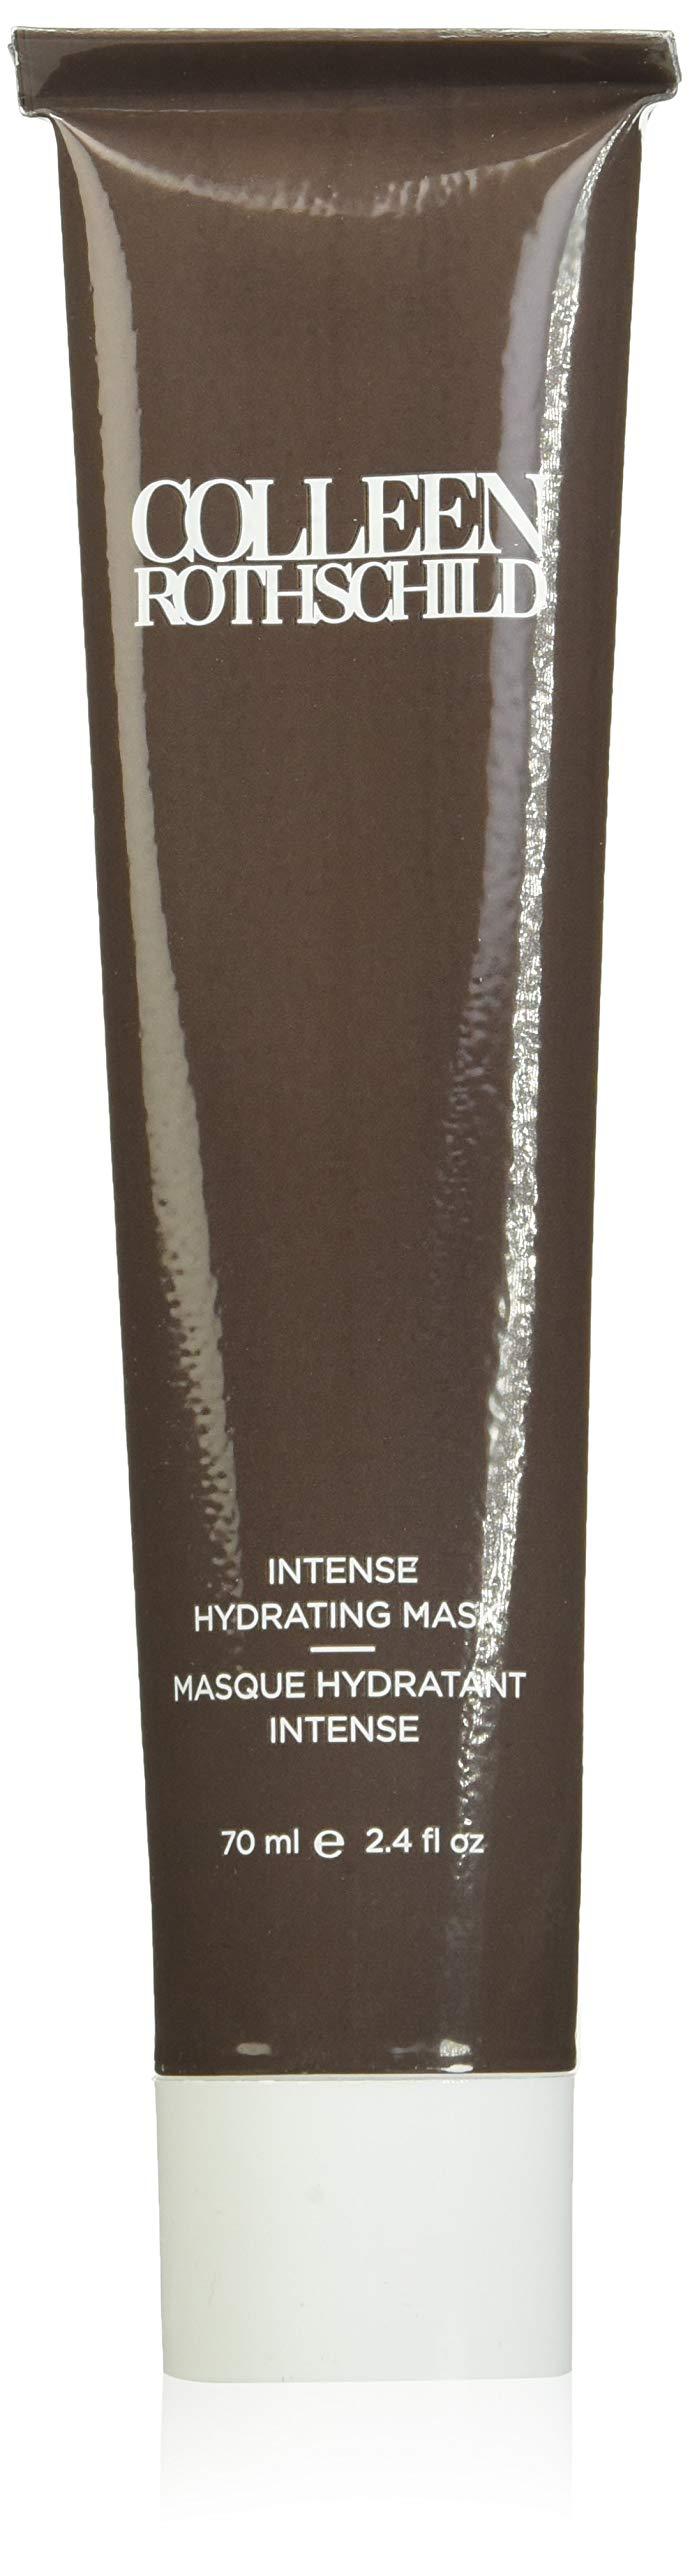 Intense Hydrating Mask, 2.4 Ounce